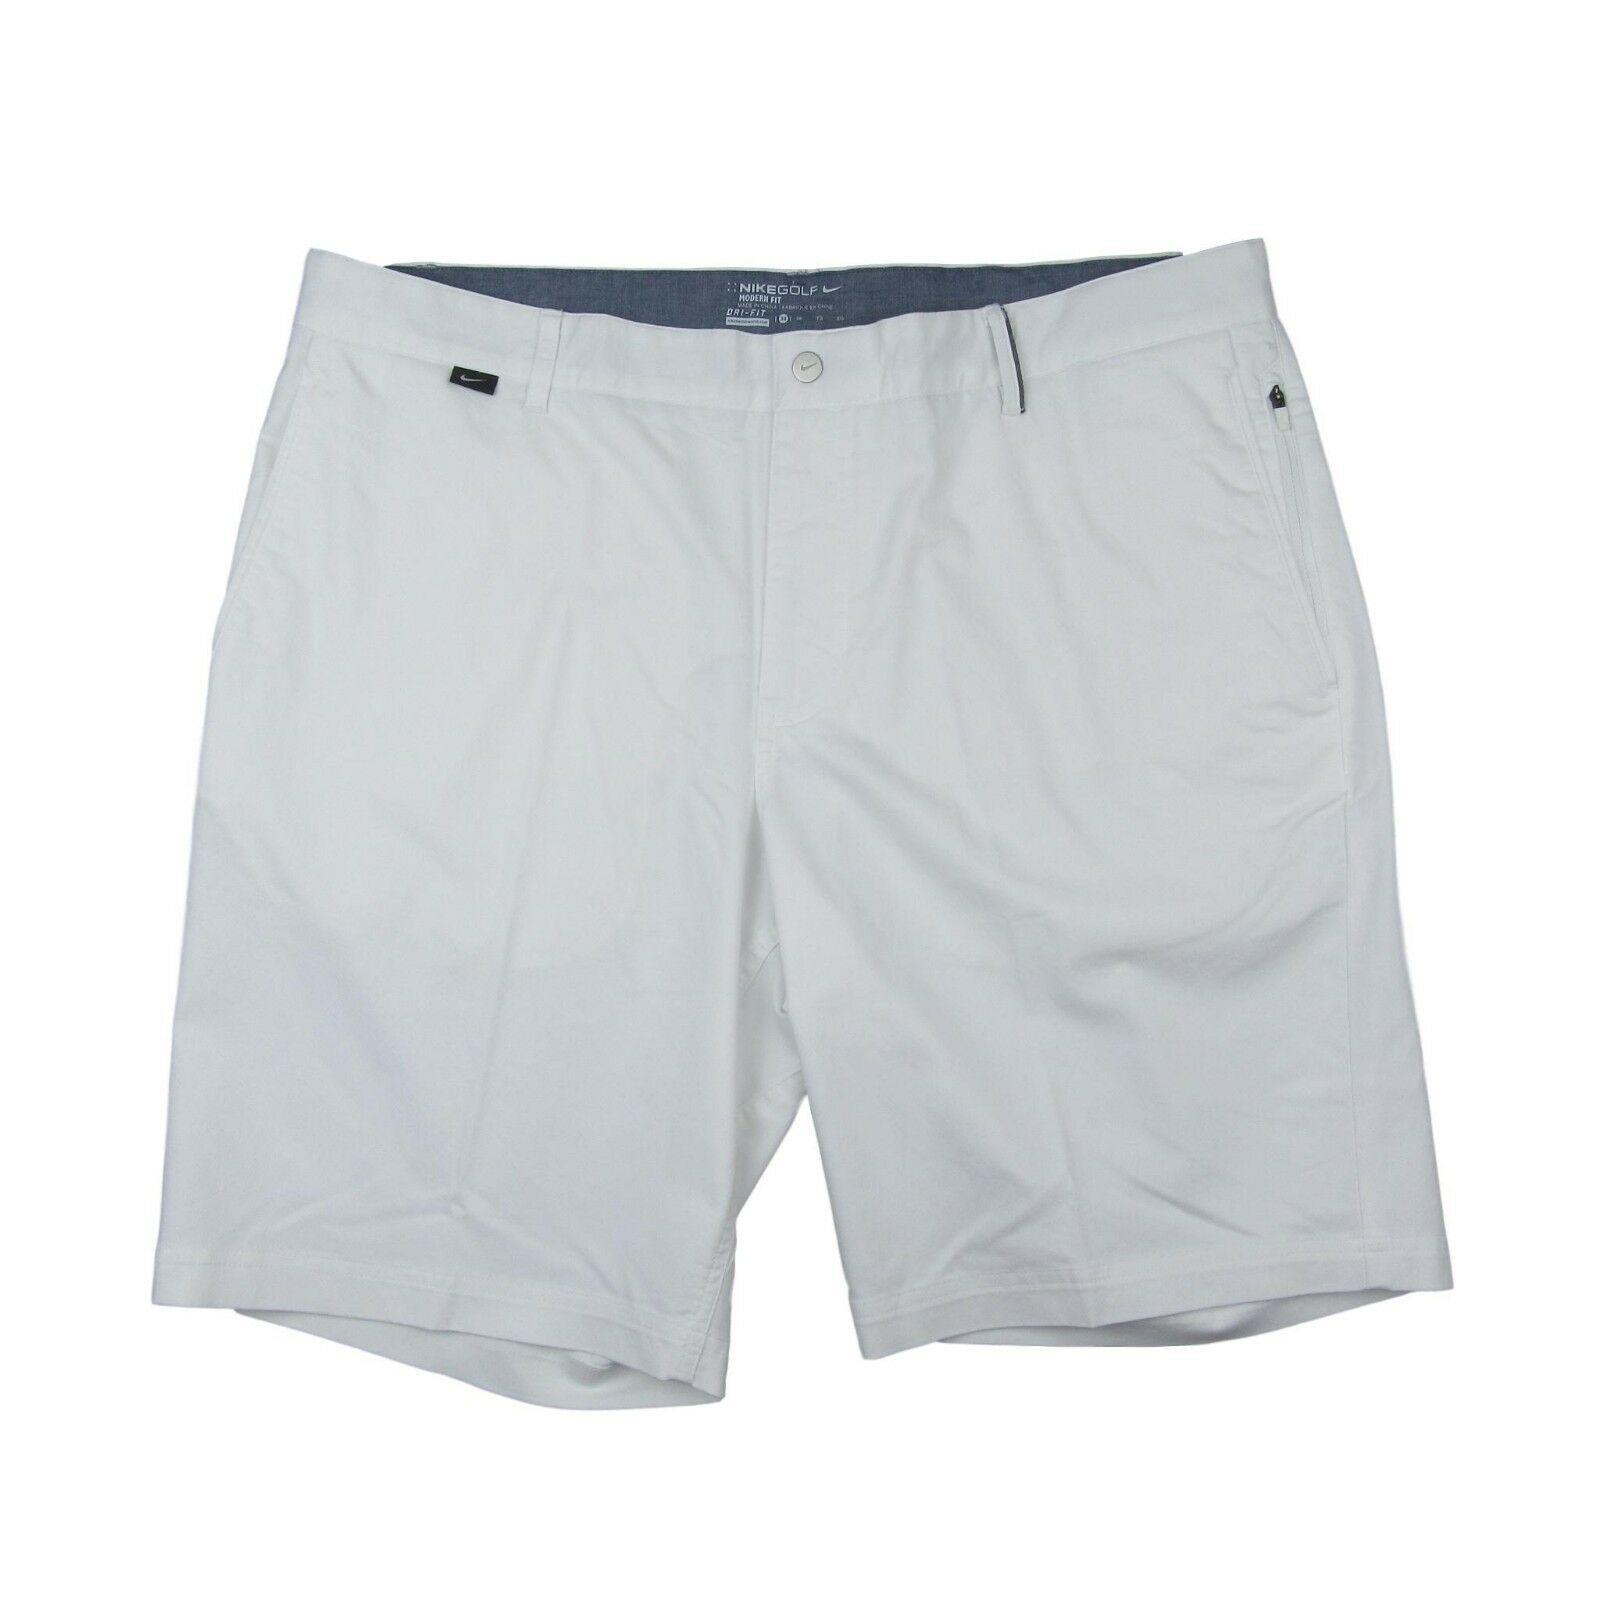 e87fee19 Nike Golf Modern Fit White Shorts Size 38 Mens 725710 100 New